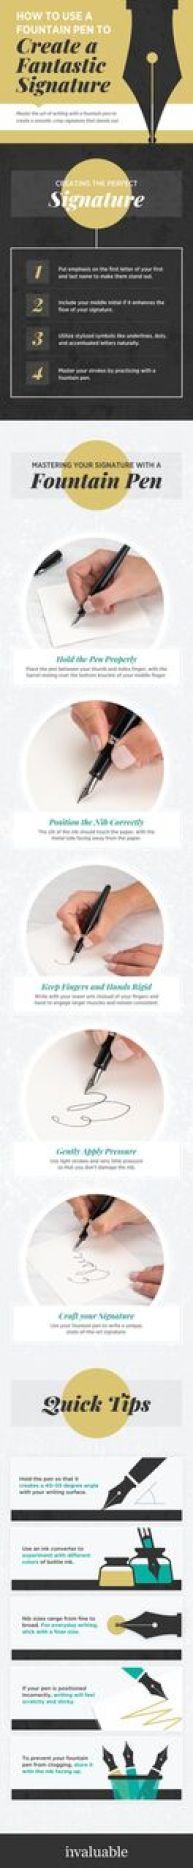 Fountain pen infographic